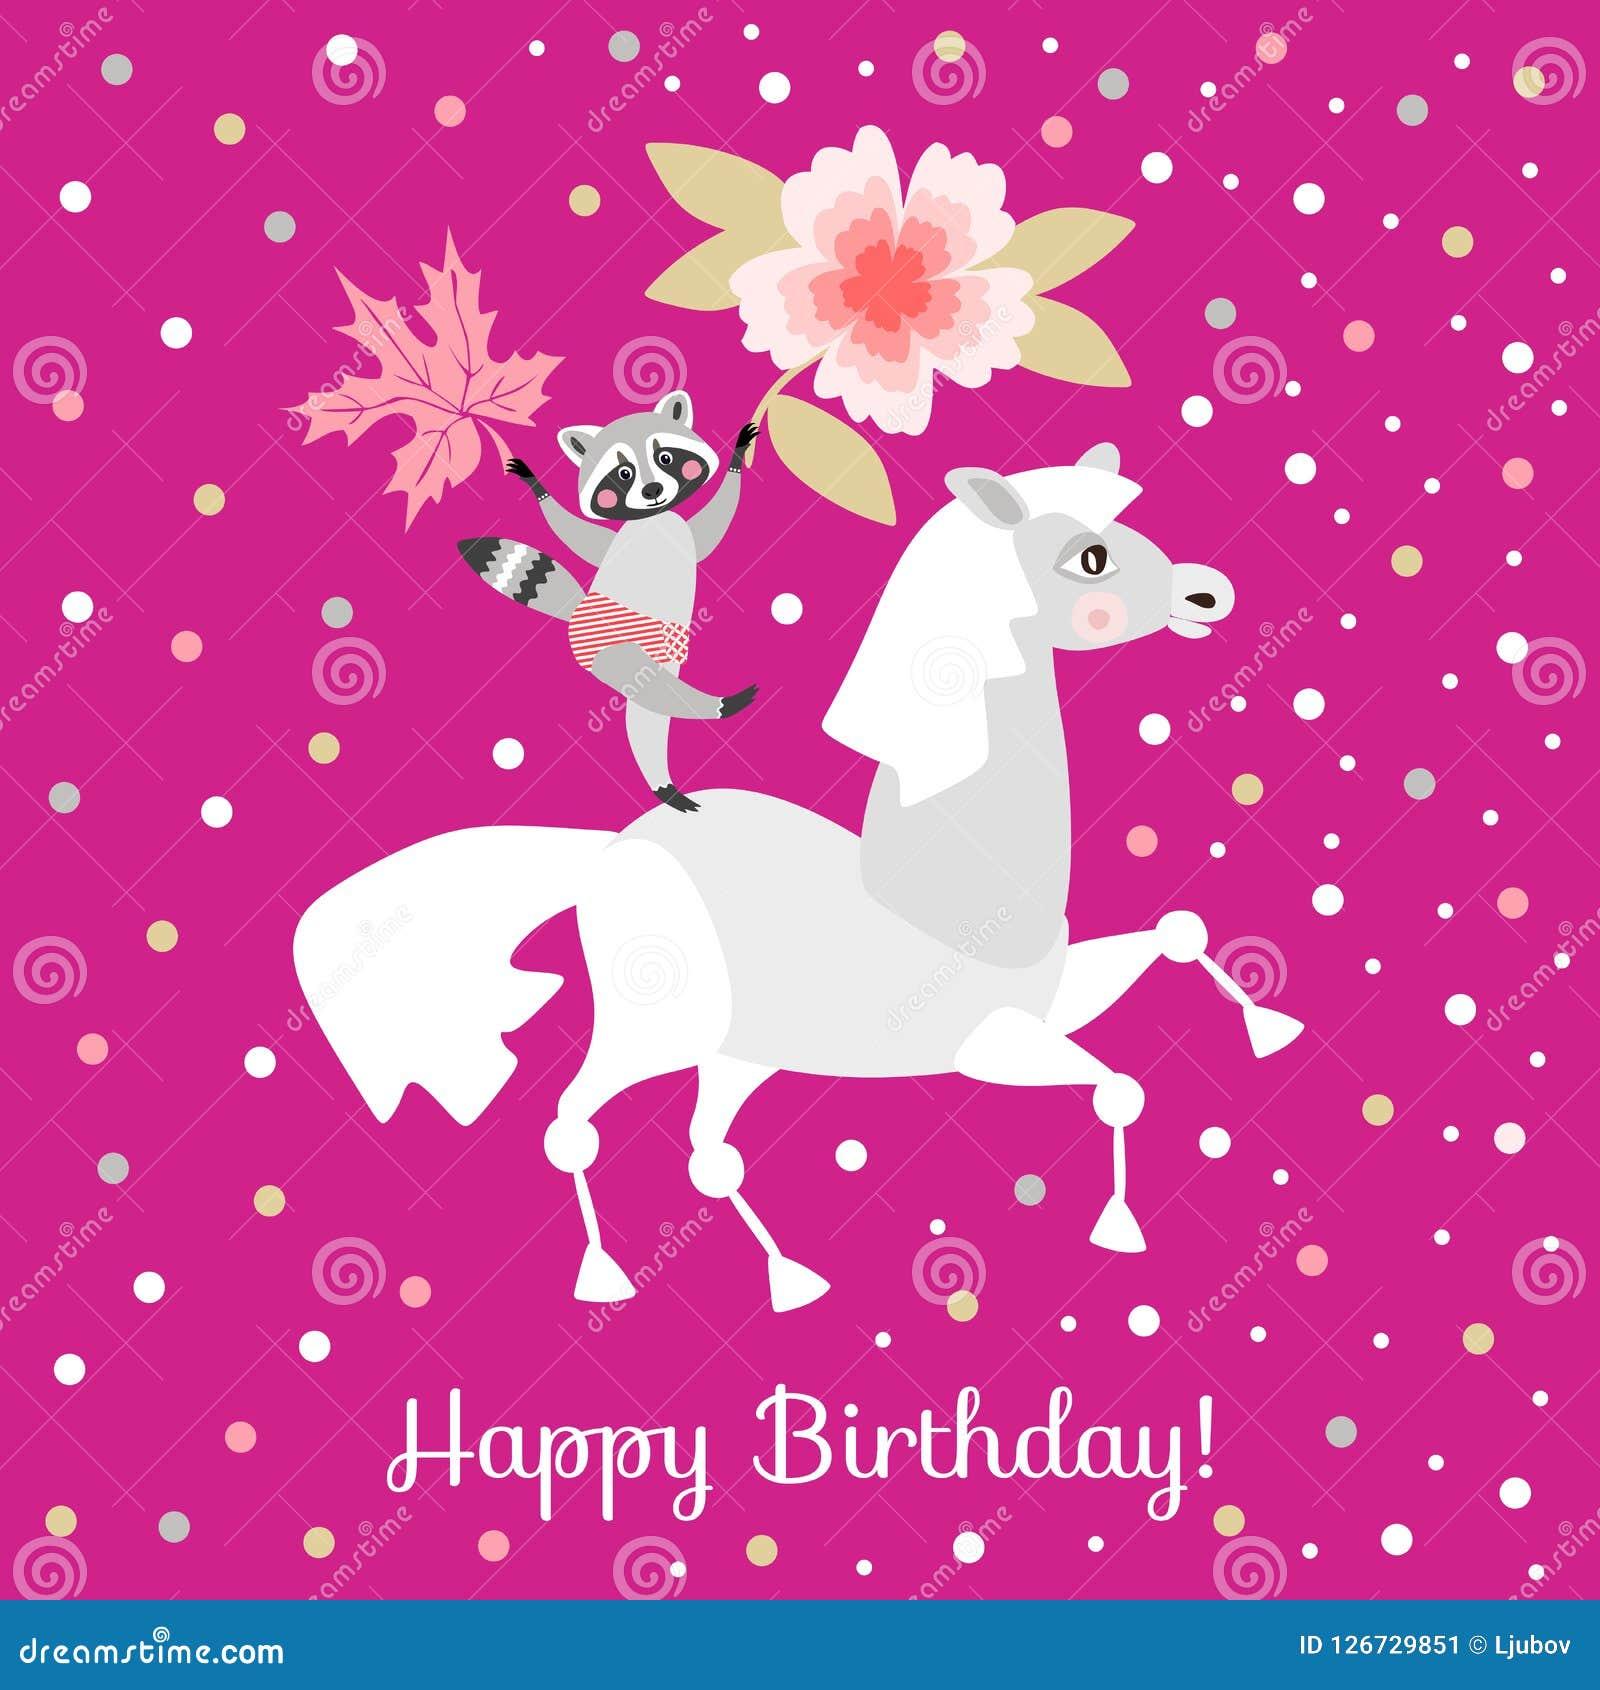 Happy Birthday Horse Stock Illustrations 6 416 Happy Birthday Horse Stock Illustrations Vectors Clipart Dreamstime